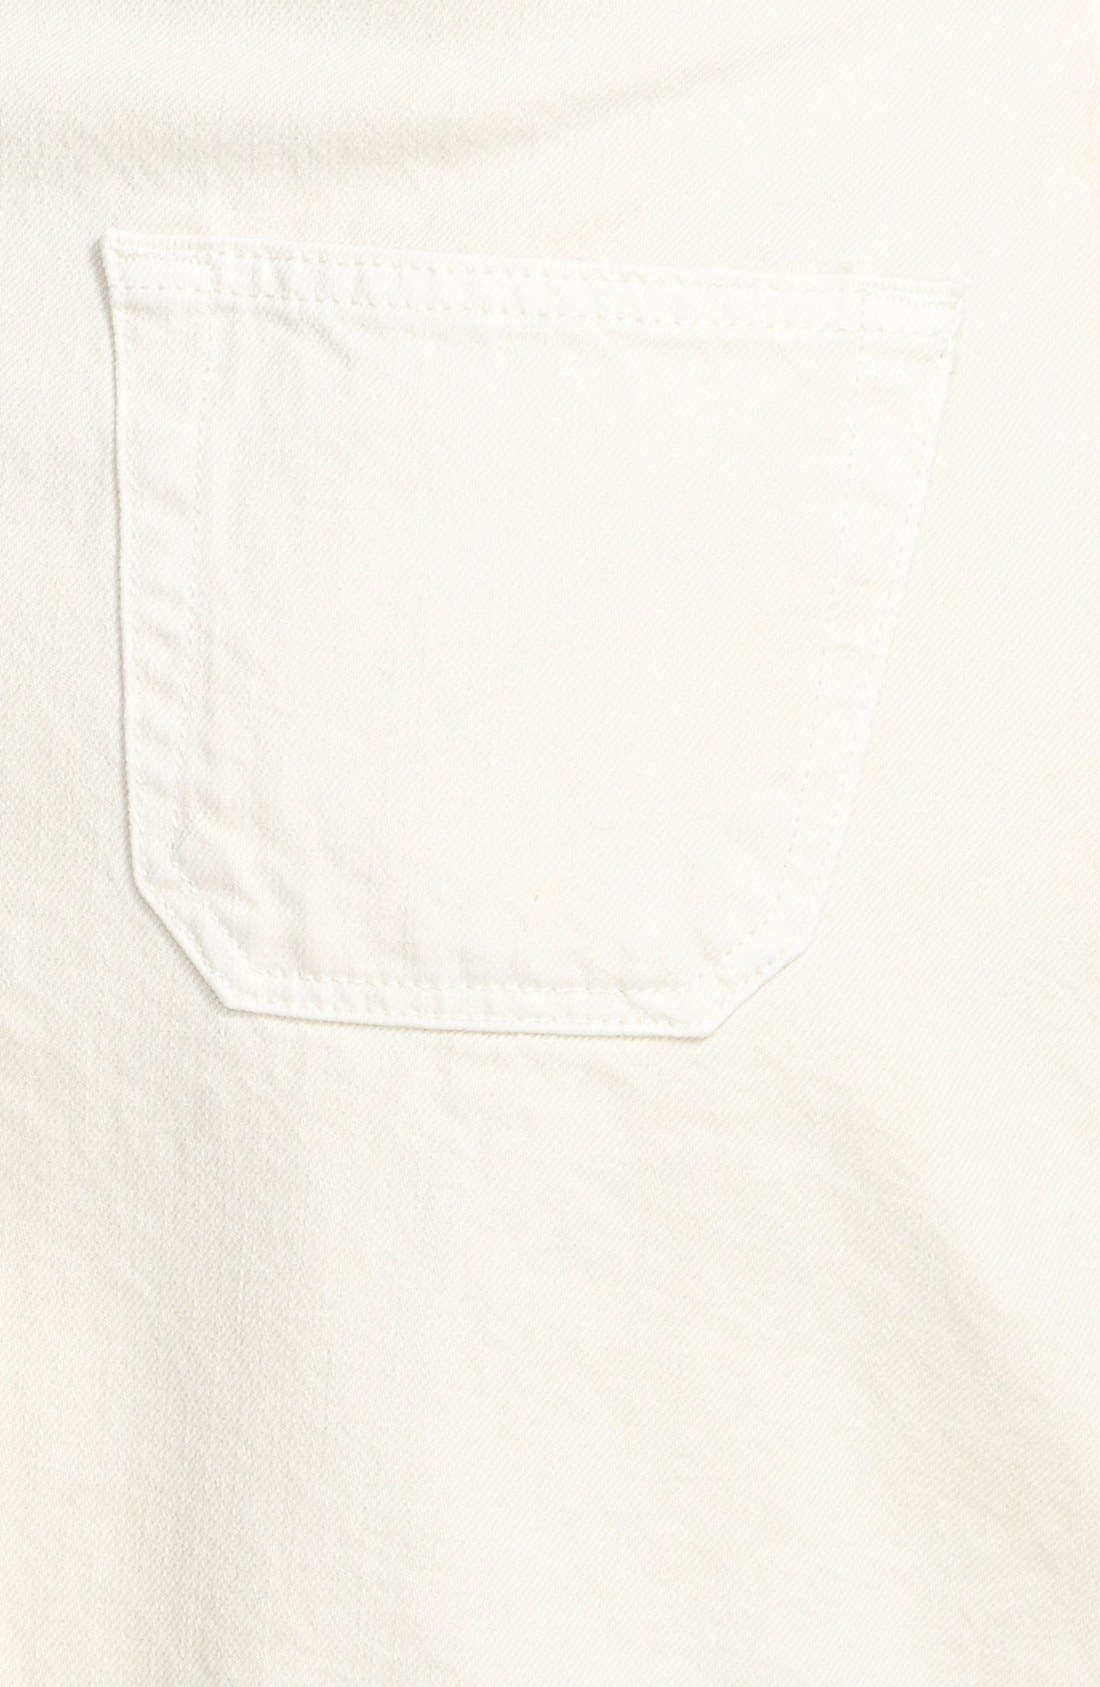 Alexa Chung for AG 'The Gillian' Overalls Dress,                             Alternate thumbnail 3, color,                             100